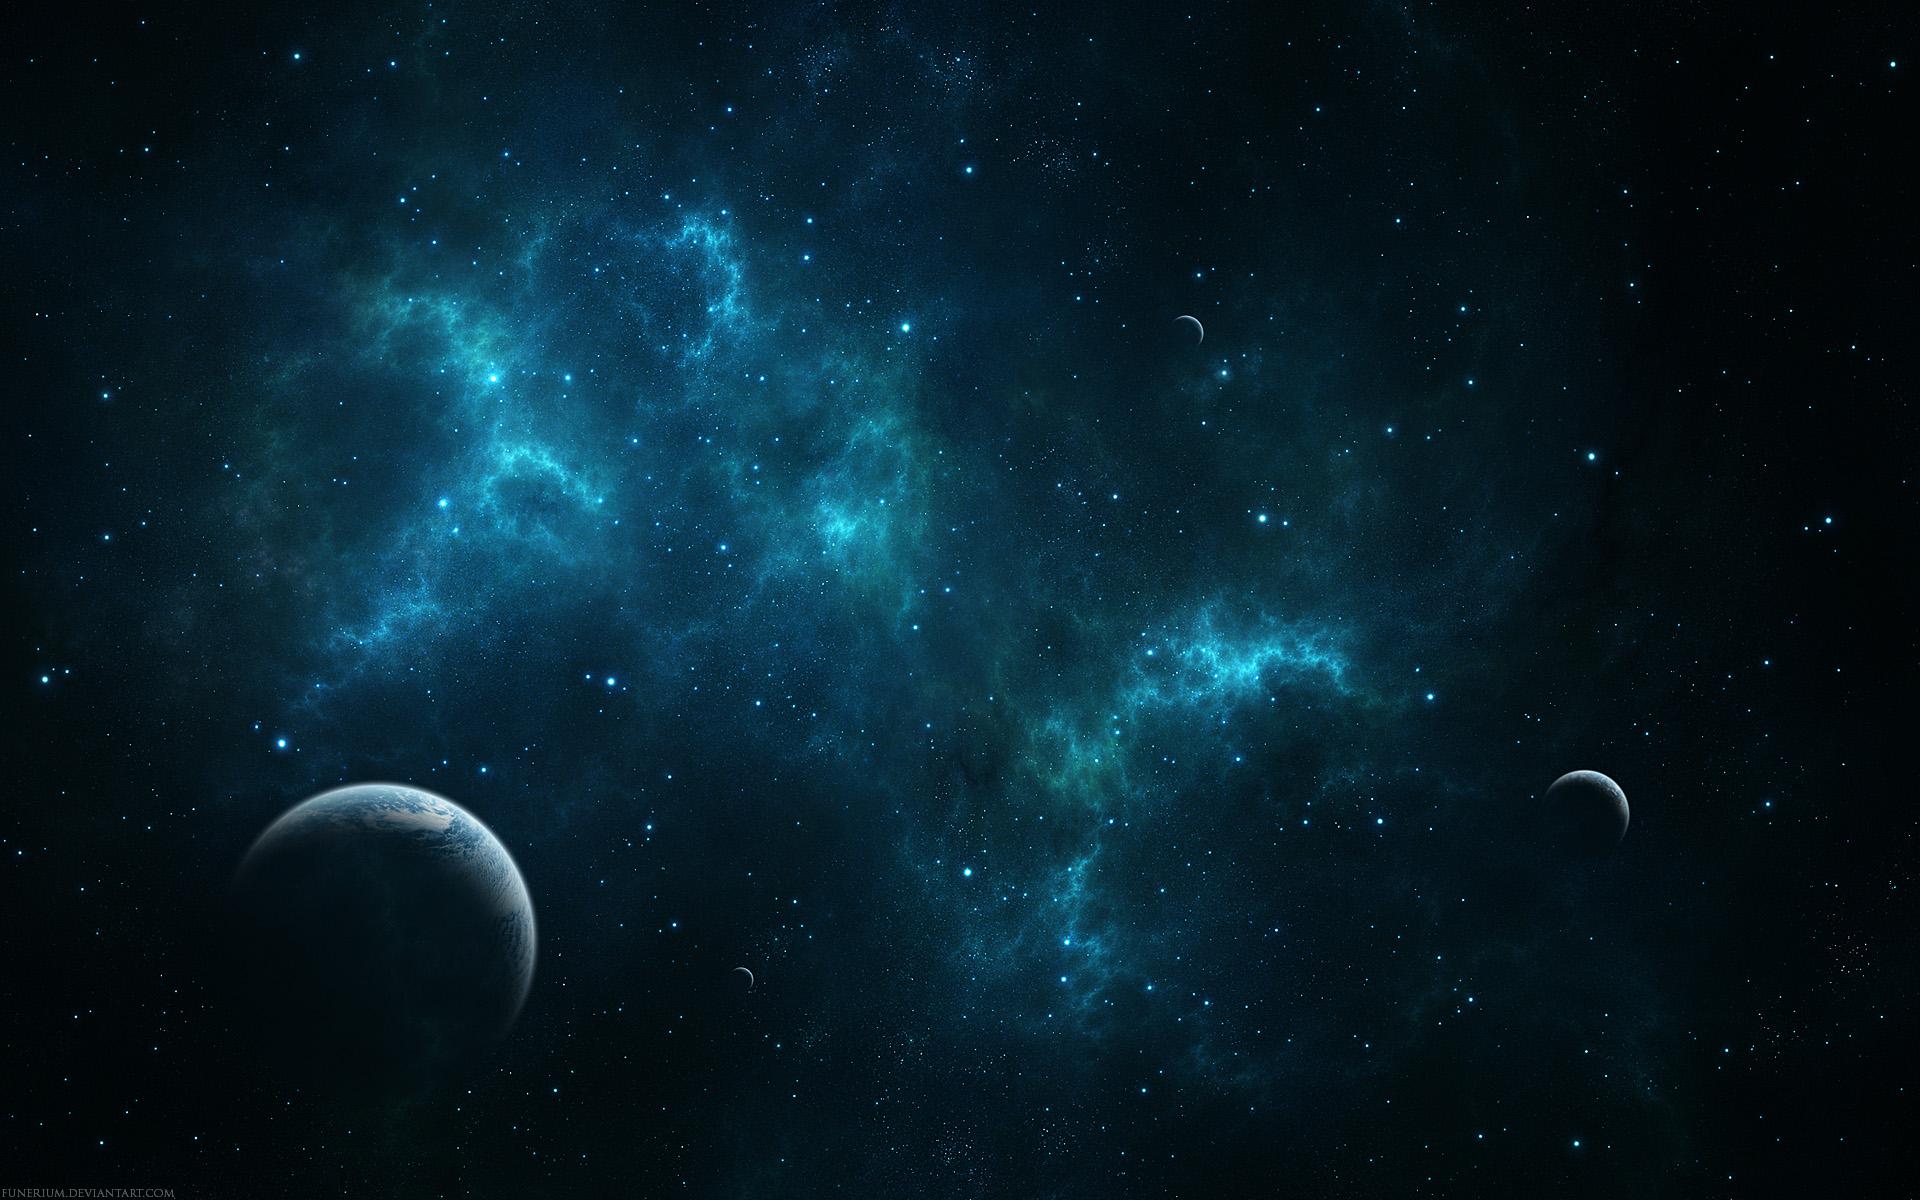 Hd Wallpaper Of Space 9 Thumb